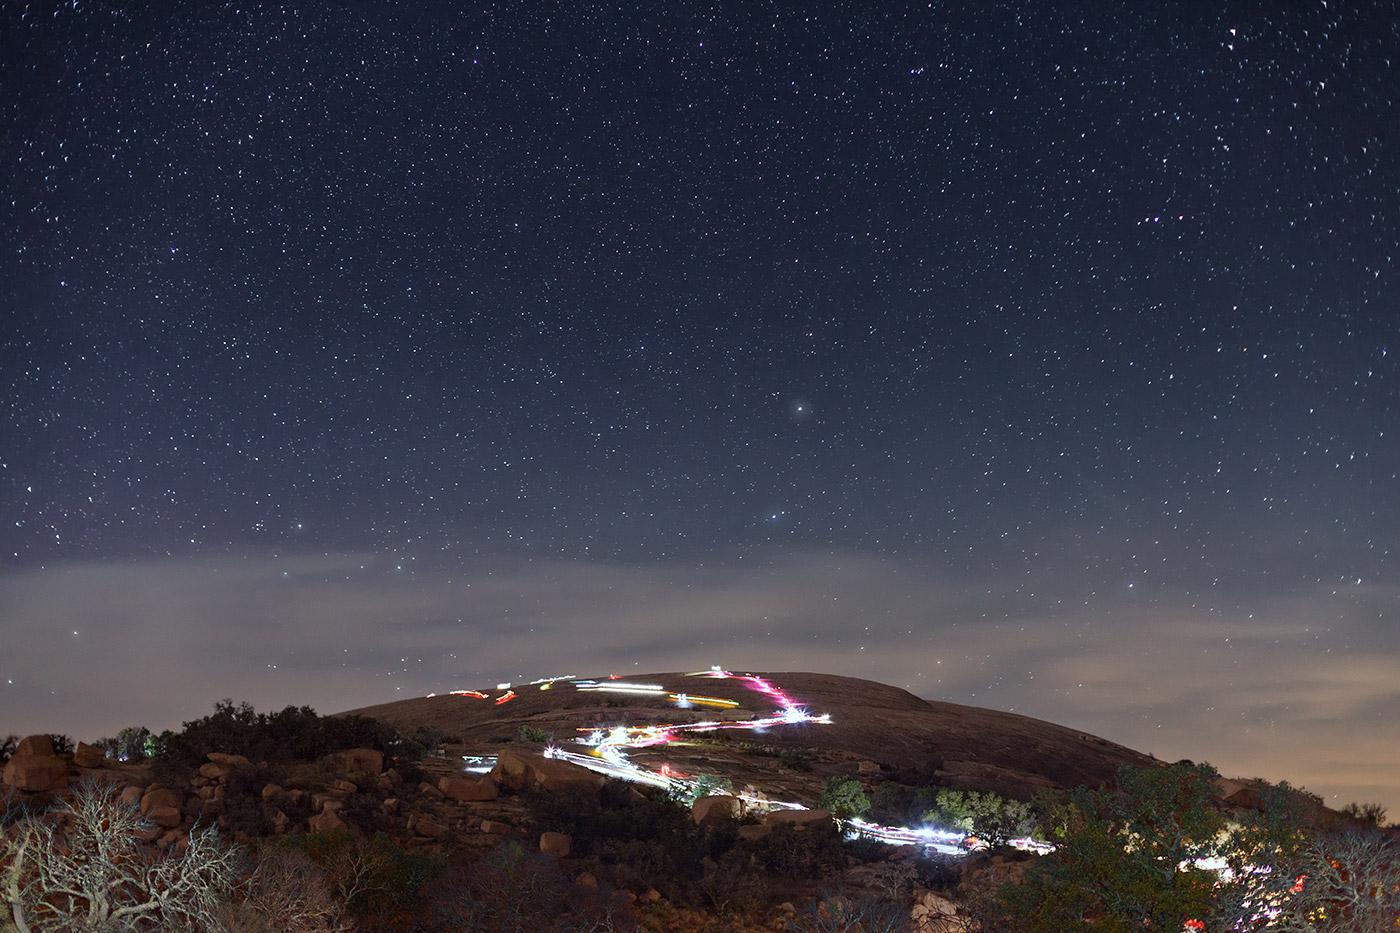 Enchanted-Rock-ABP-Stars_light-trails2.jpg